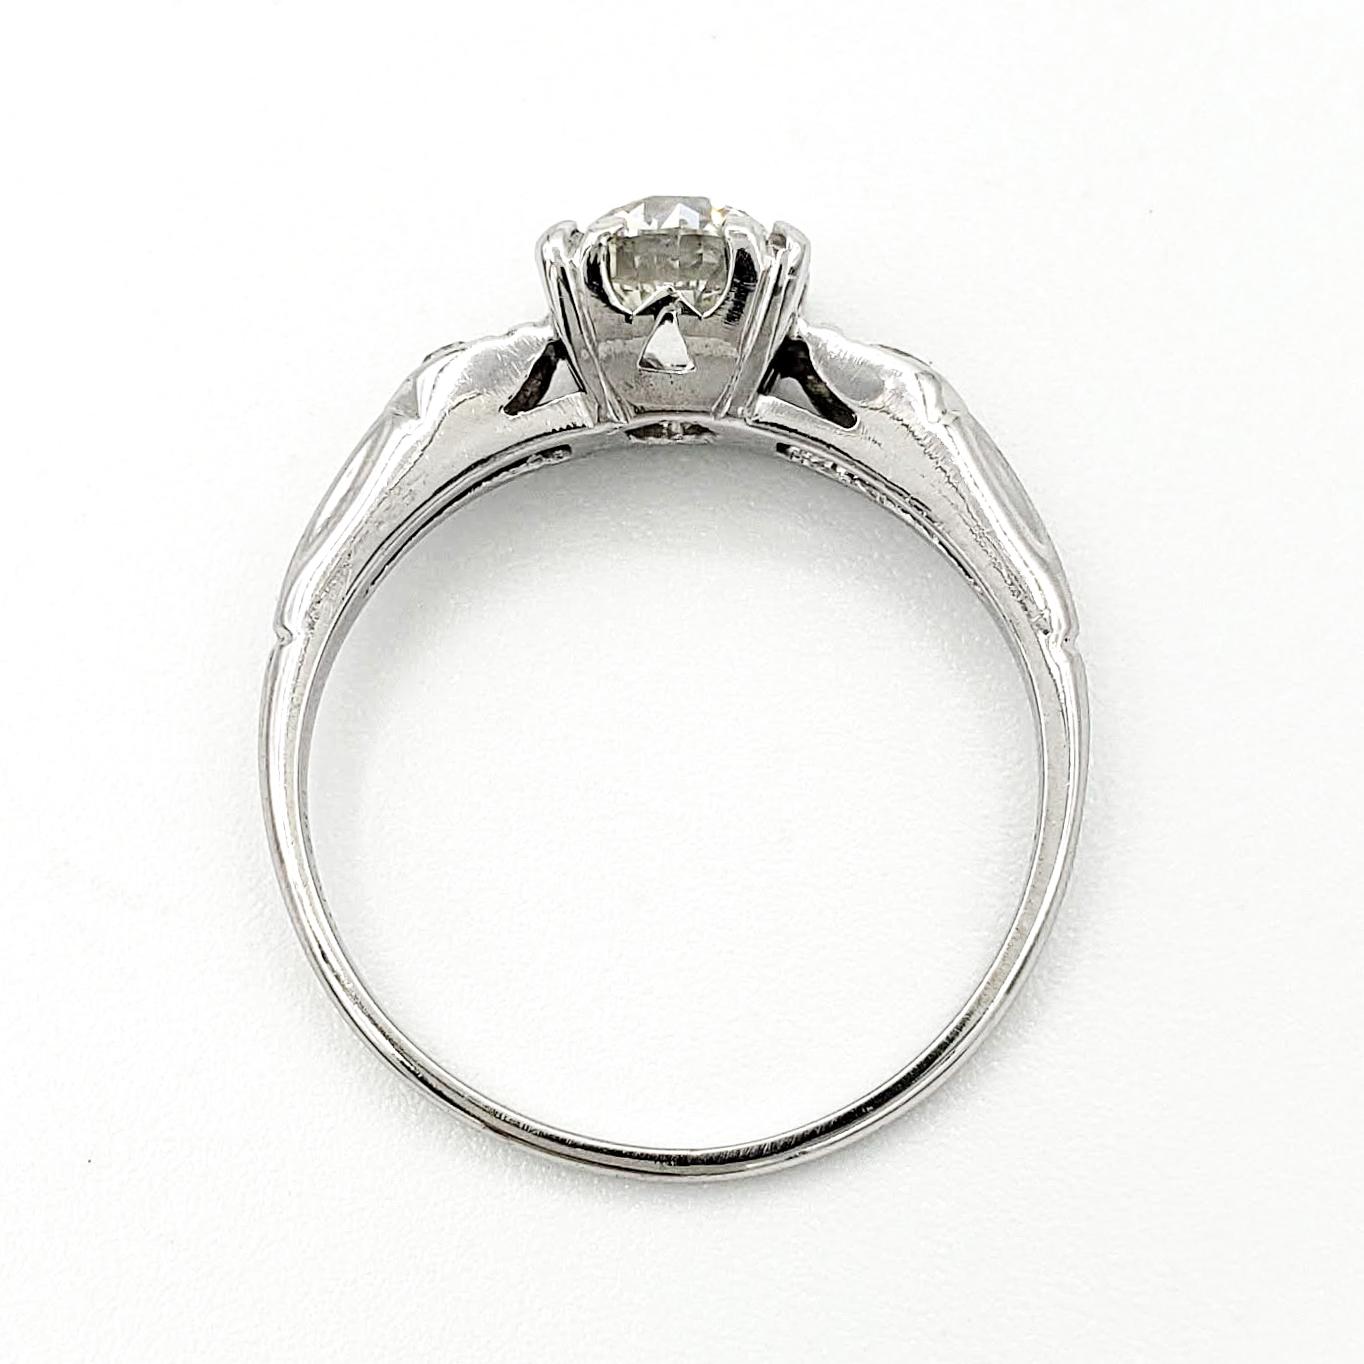 vintage-platinum-engagement-ring-with-0-83-carat-old-european-cut-diamond-egl-h-vs2